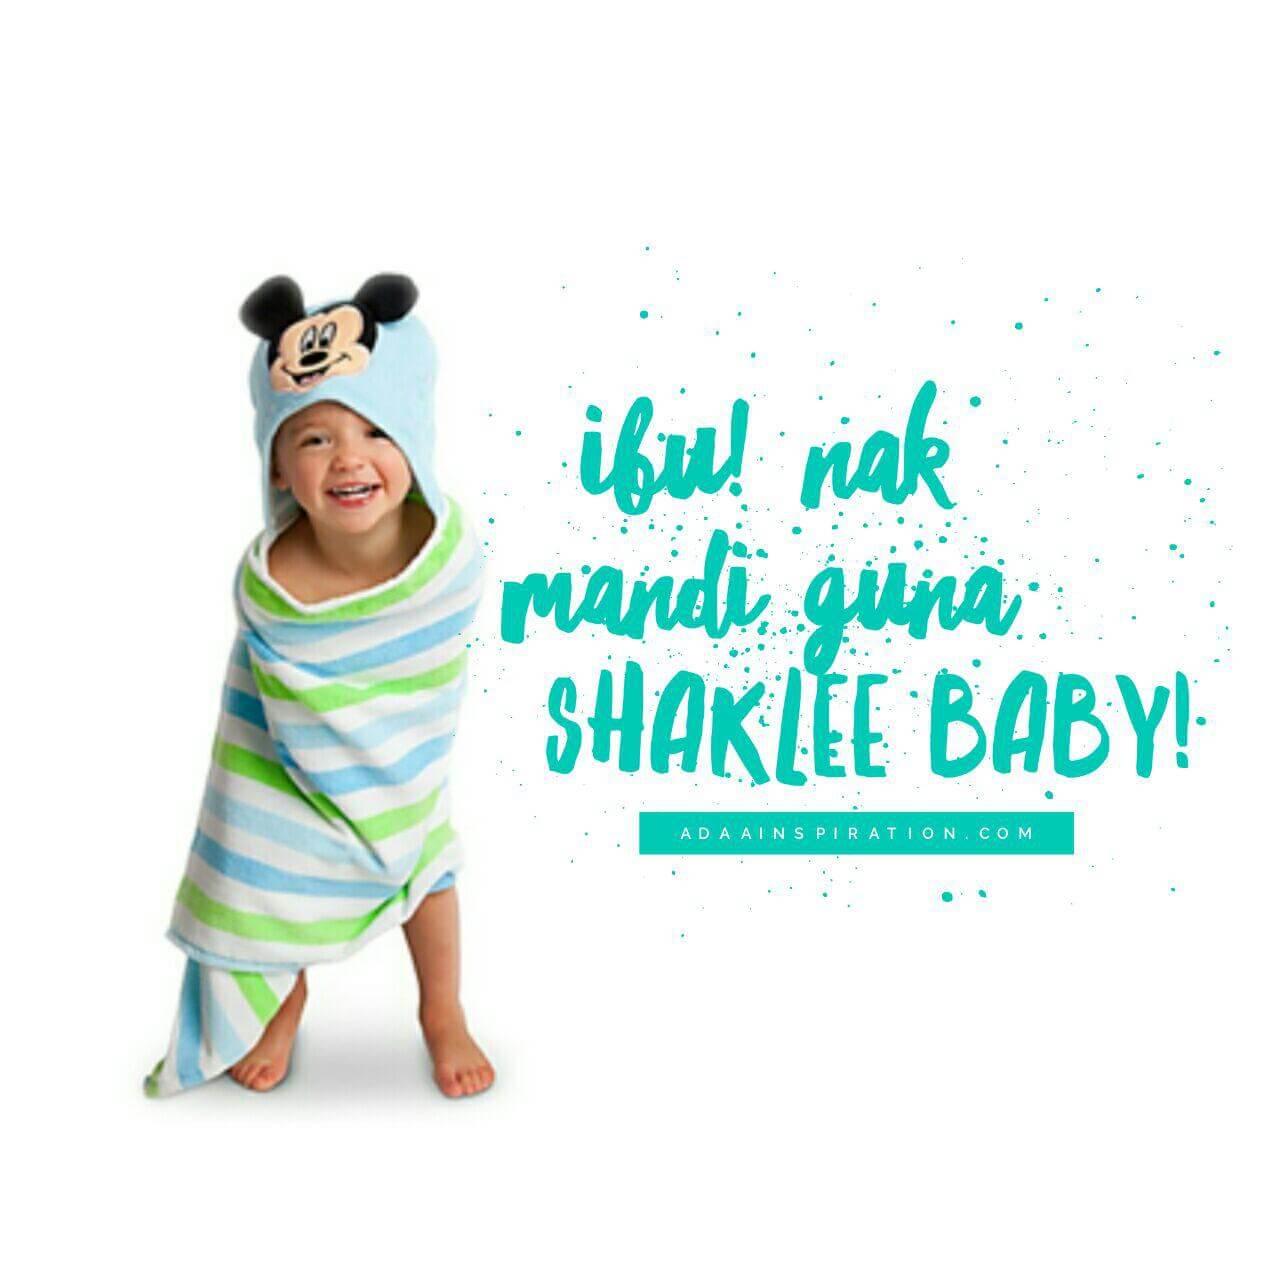 shaklee untuk bayi